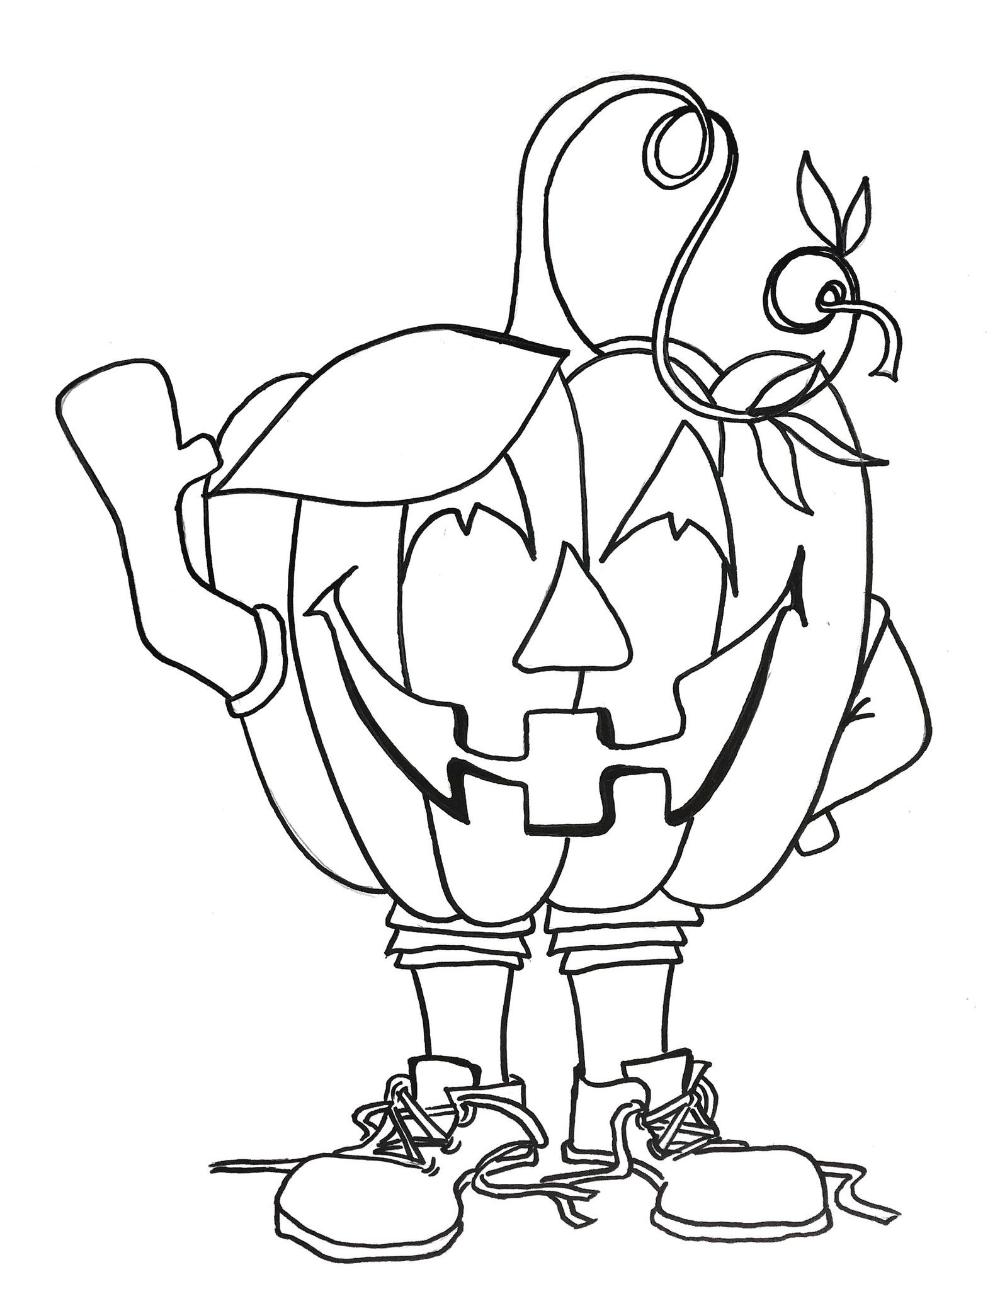 Happy Pumpkin Halloween Coloring Sheet Etsy Halloween Coloring Halloween Coloring Sheets Pumpkin Books